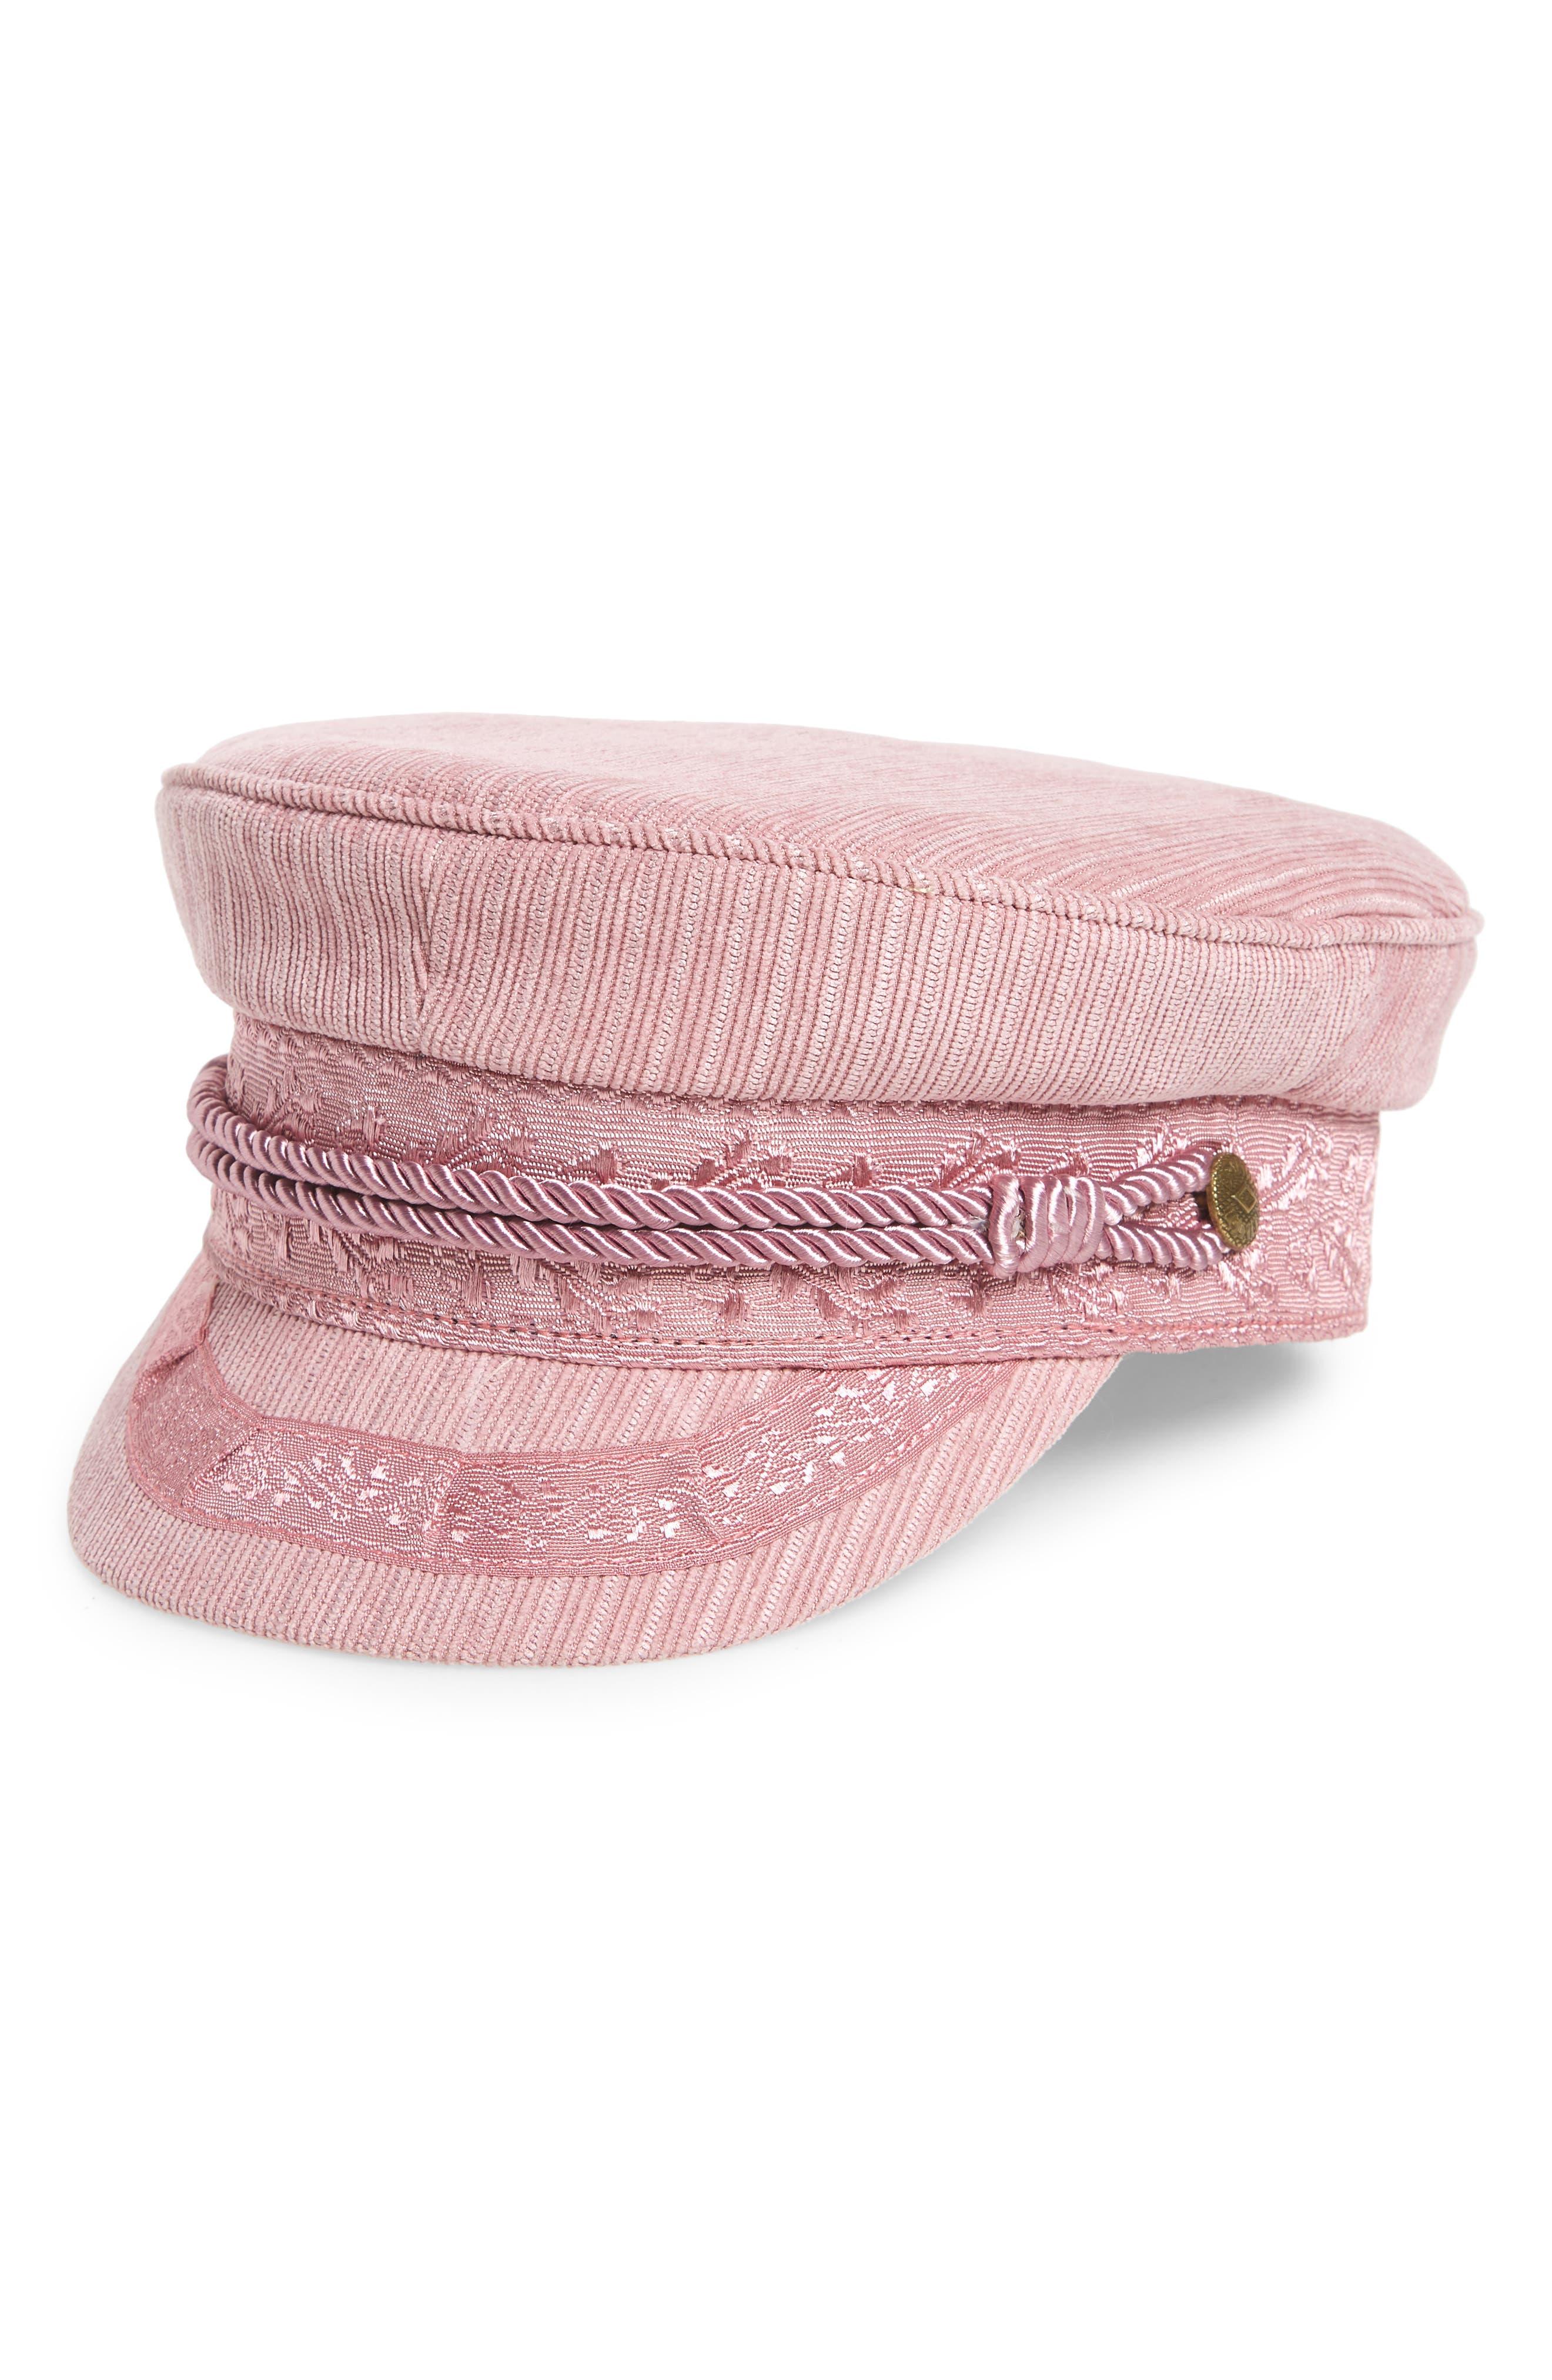 ALBANY CORDUROY FISHERMAN CAP - PINK